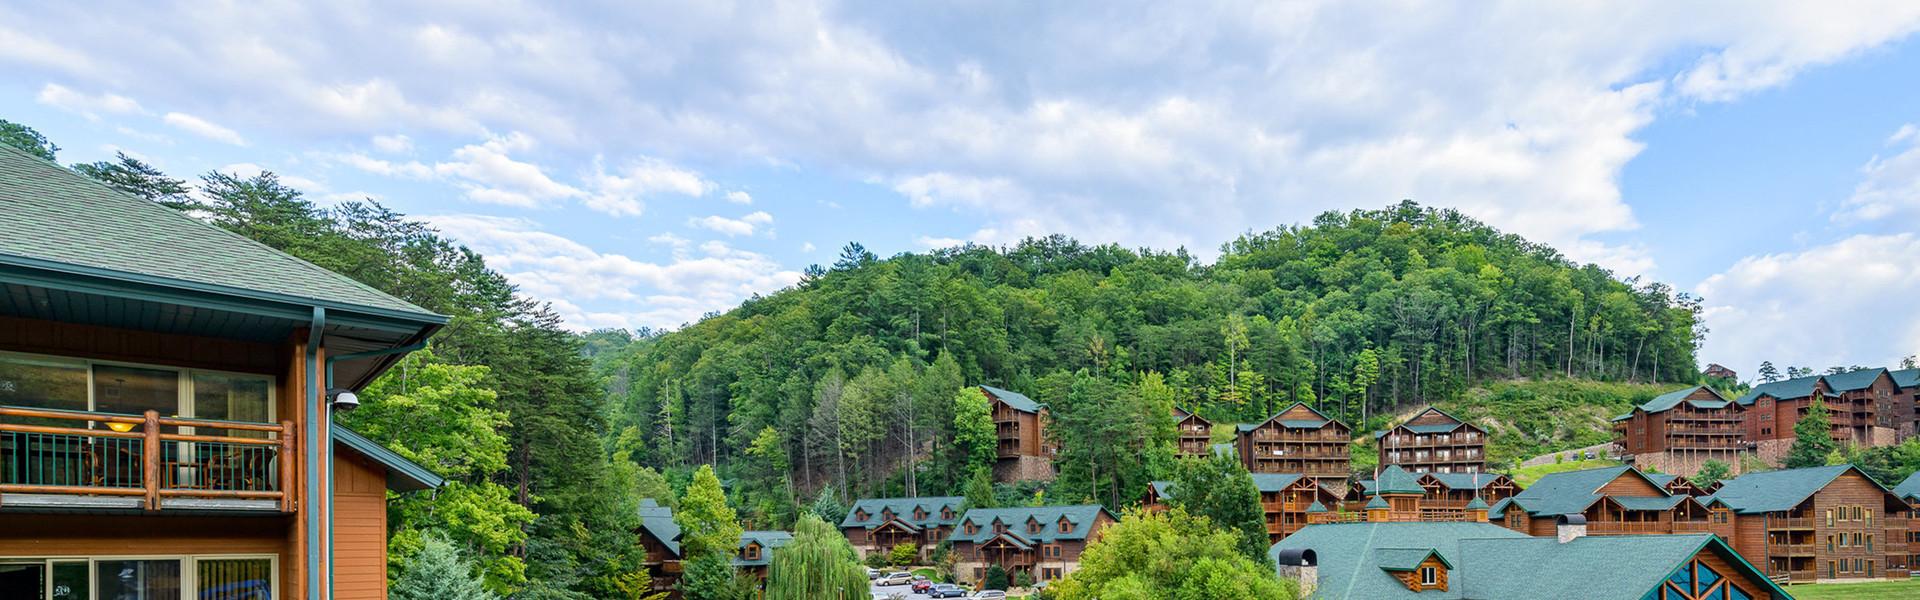 Awards for Our Gatlinburg Resort near the Smoky Mountains | Prestigious Resort